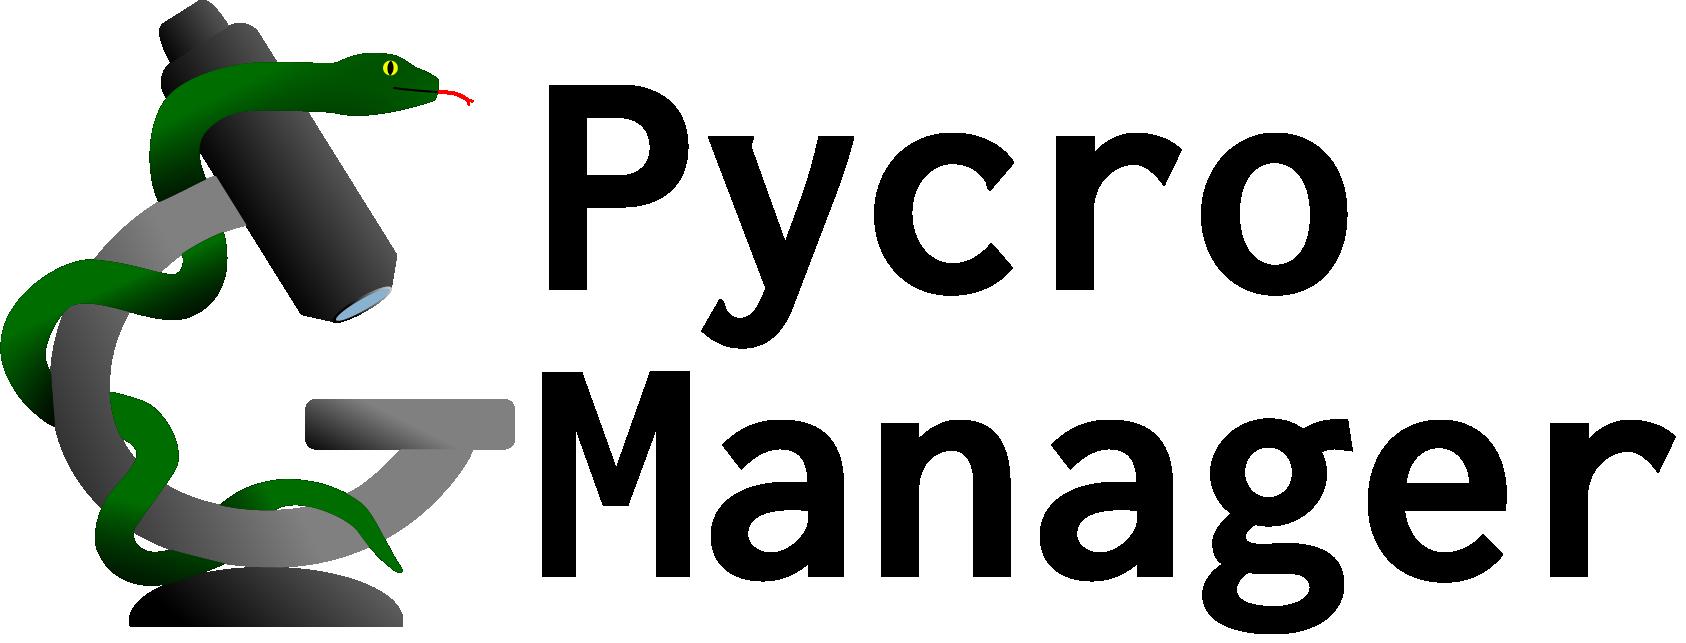 Pycro-Manager logo banner